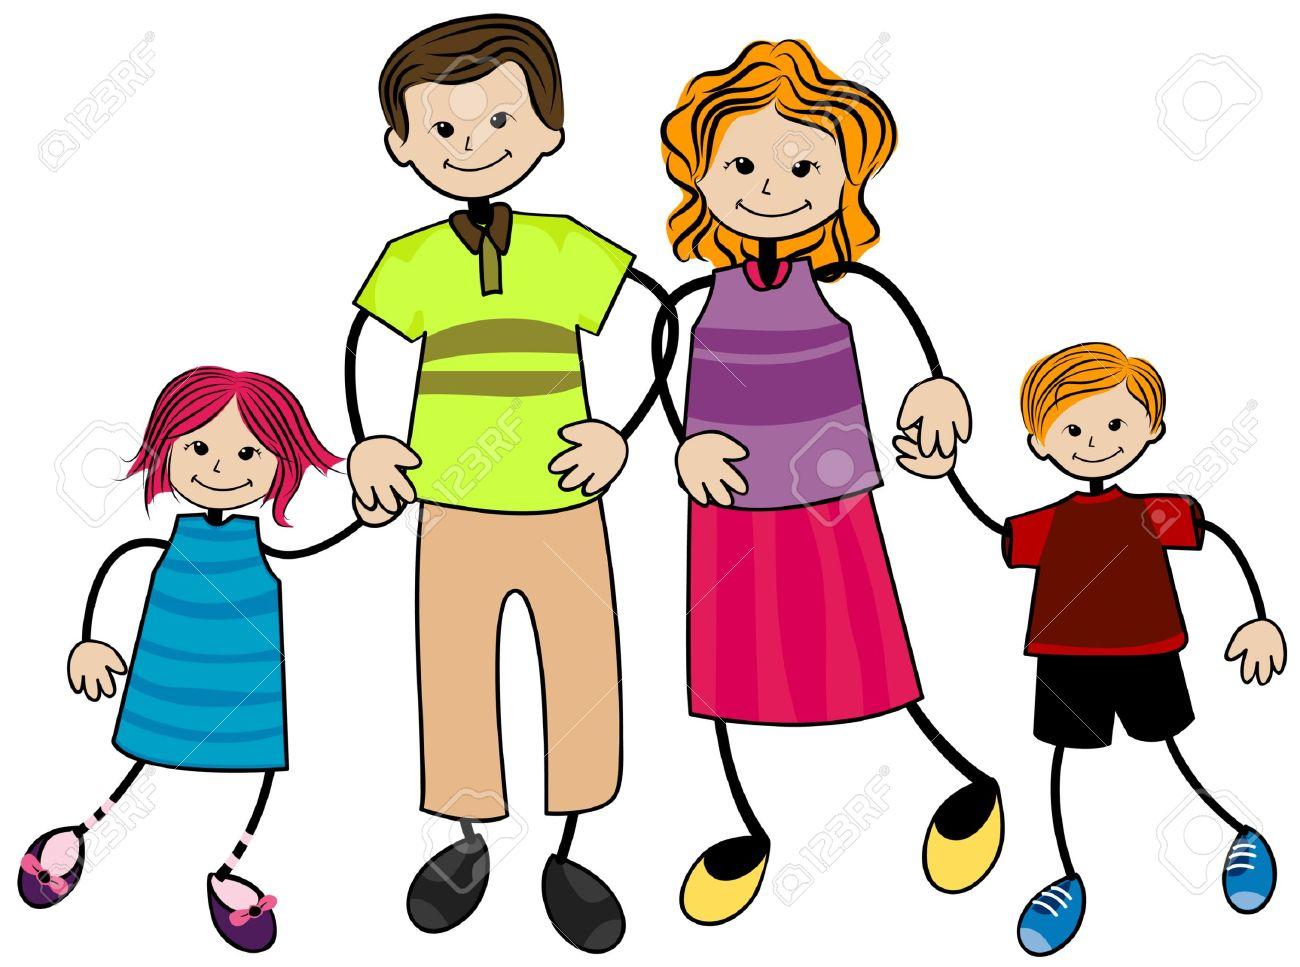 Family photos clipart clipart My Family Clipart | Free download best My Family Clipart on ... clipart